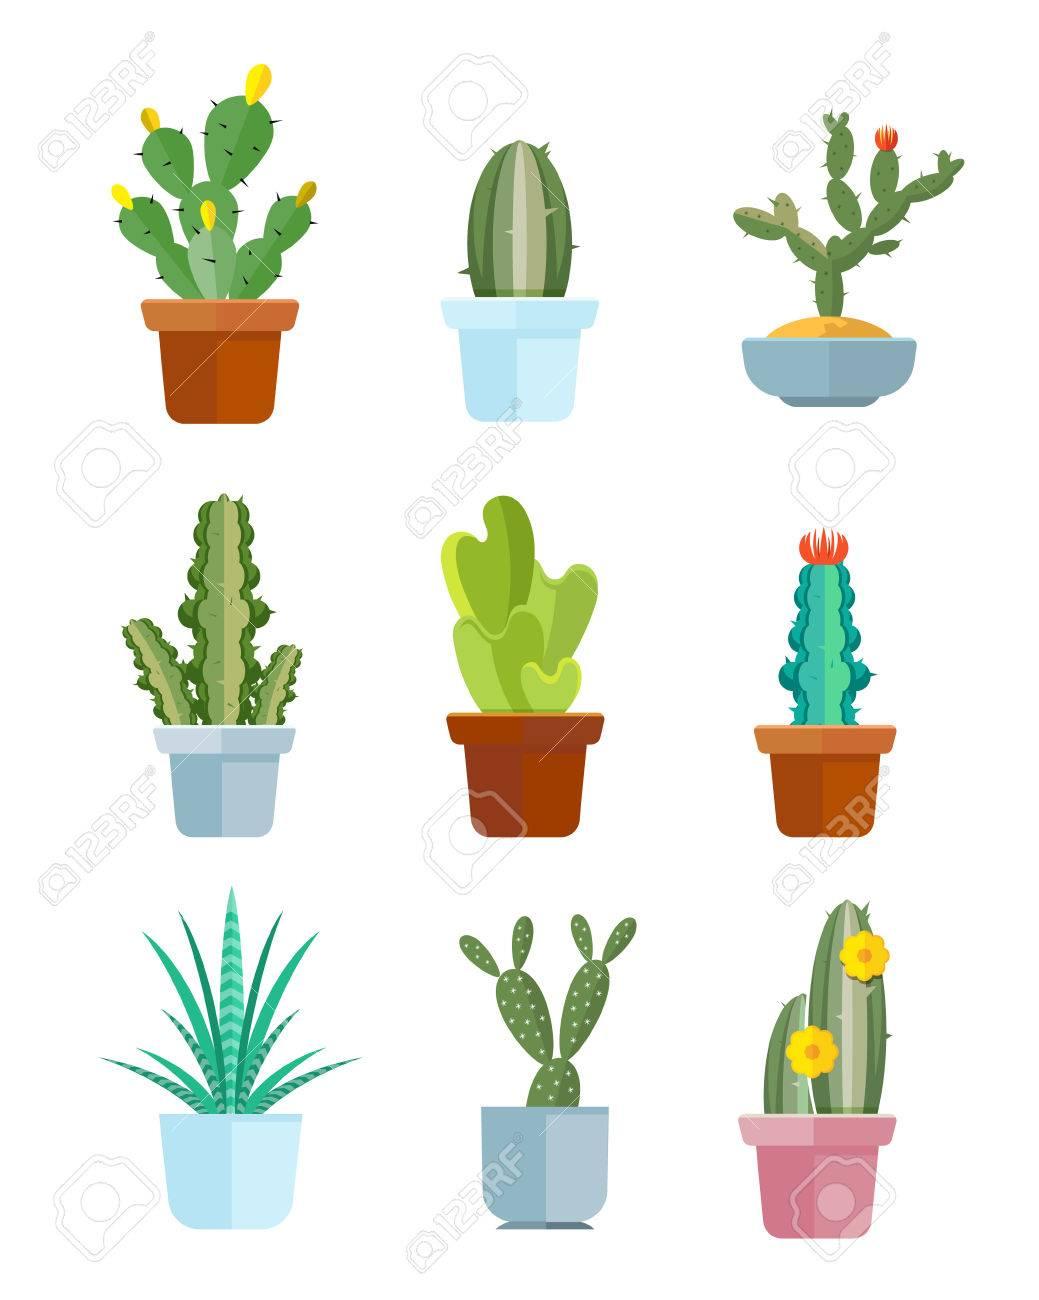 Cartoon cactus, desert plants vector icons  Bloom mexican cacti